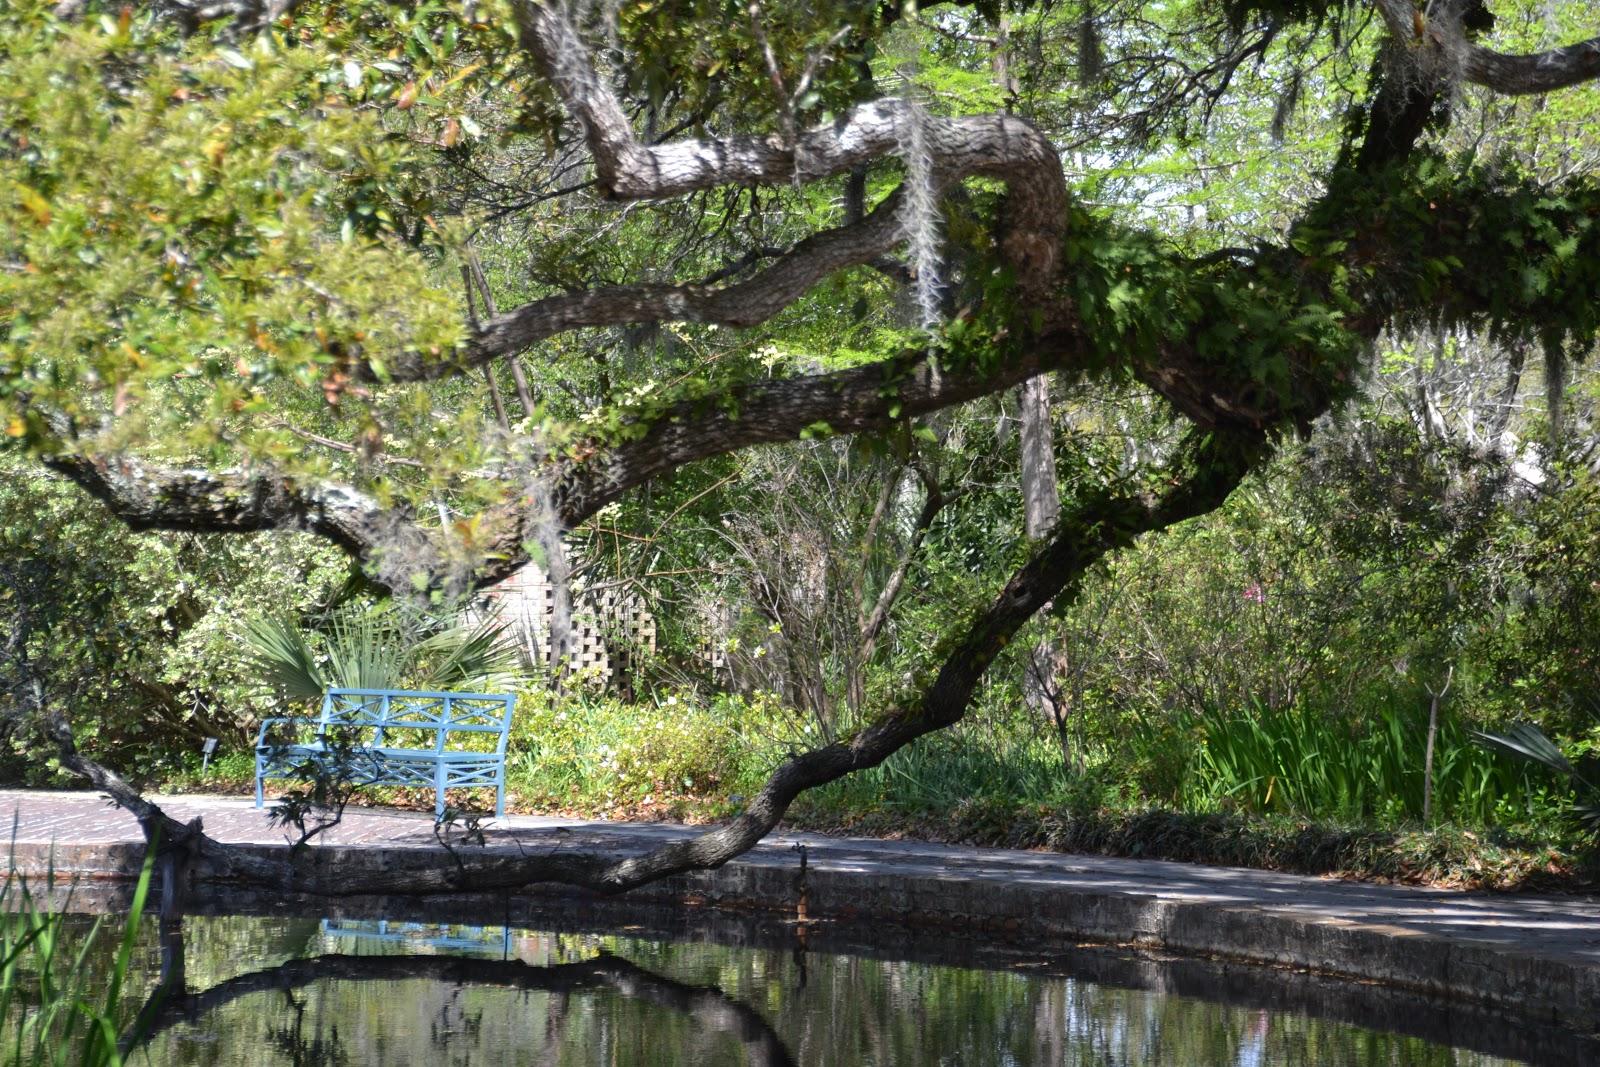 Elaine\'s Blogging World: Myrtle Beach - Spanish Moss Covered Trees